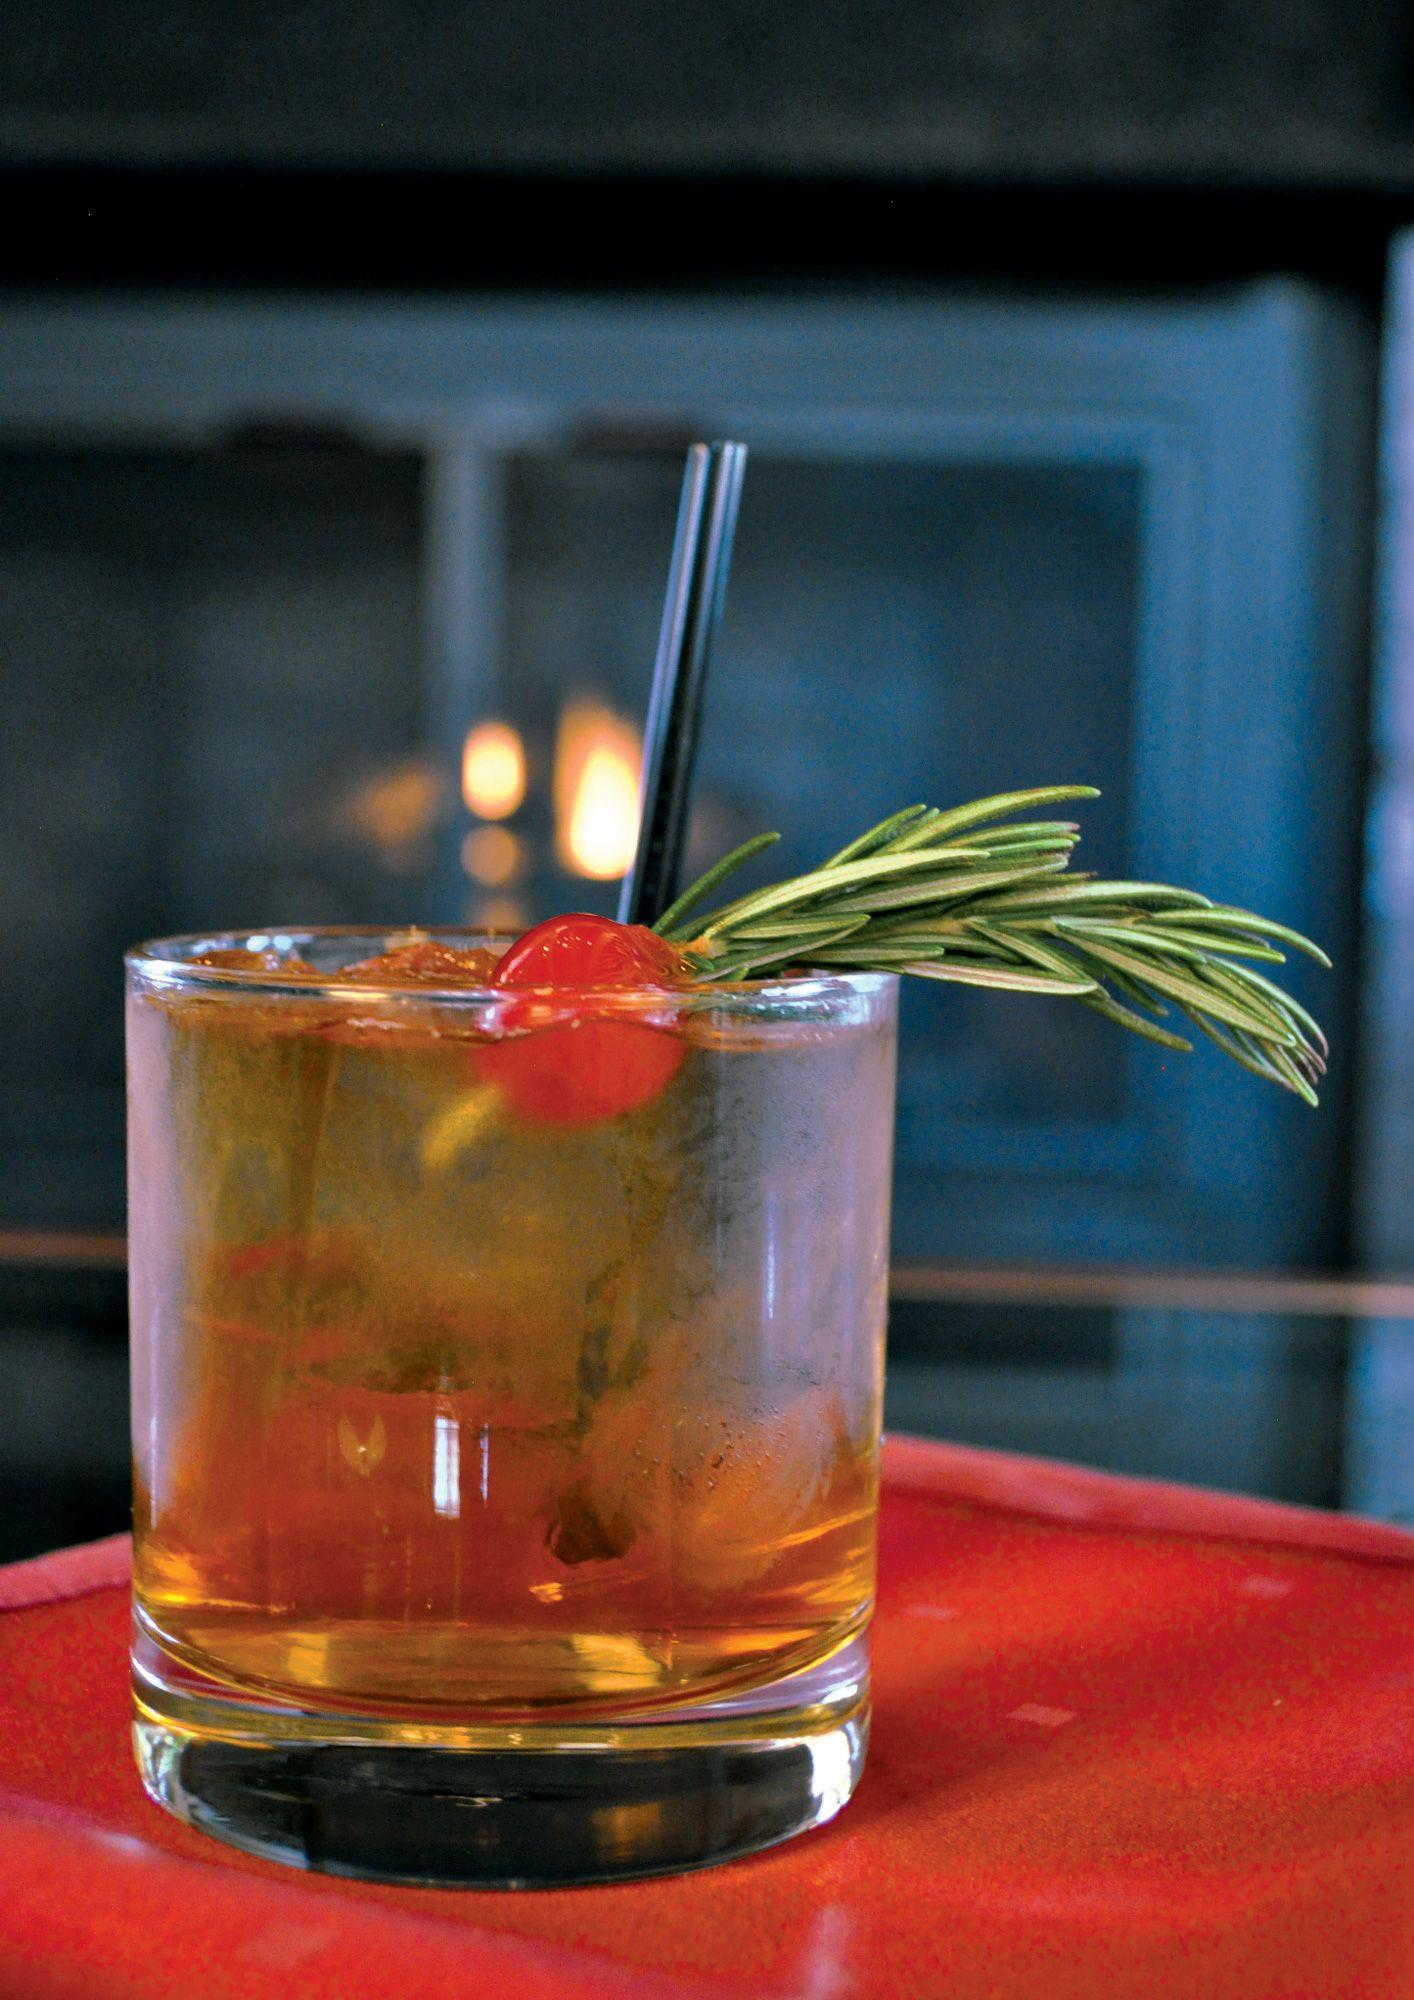 Co me mistletoe martini drinks cocktails